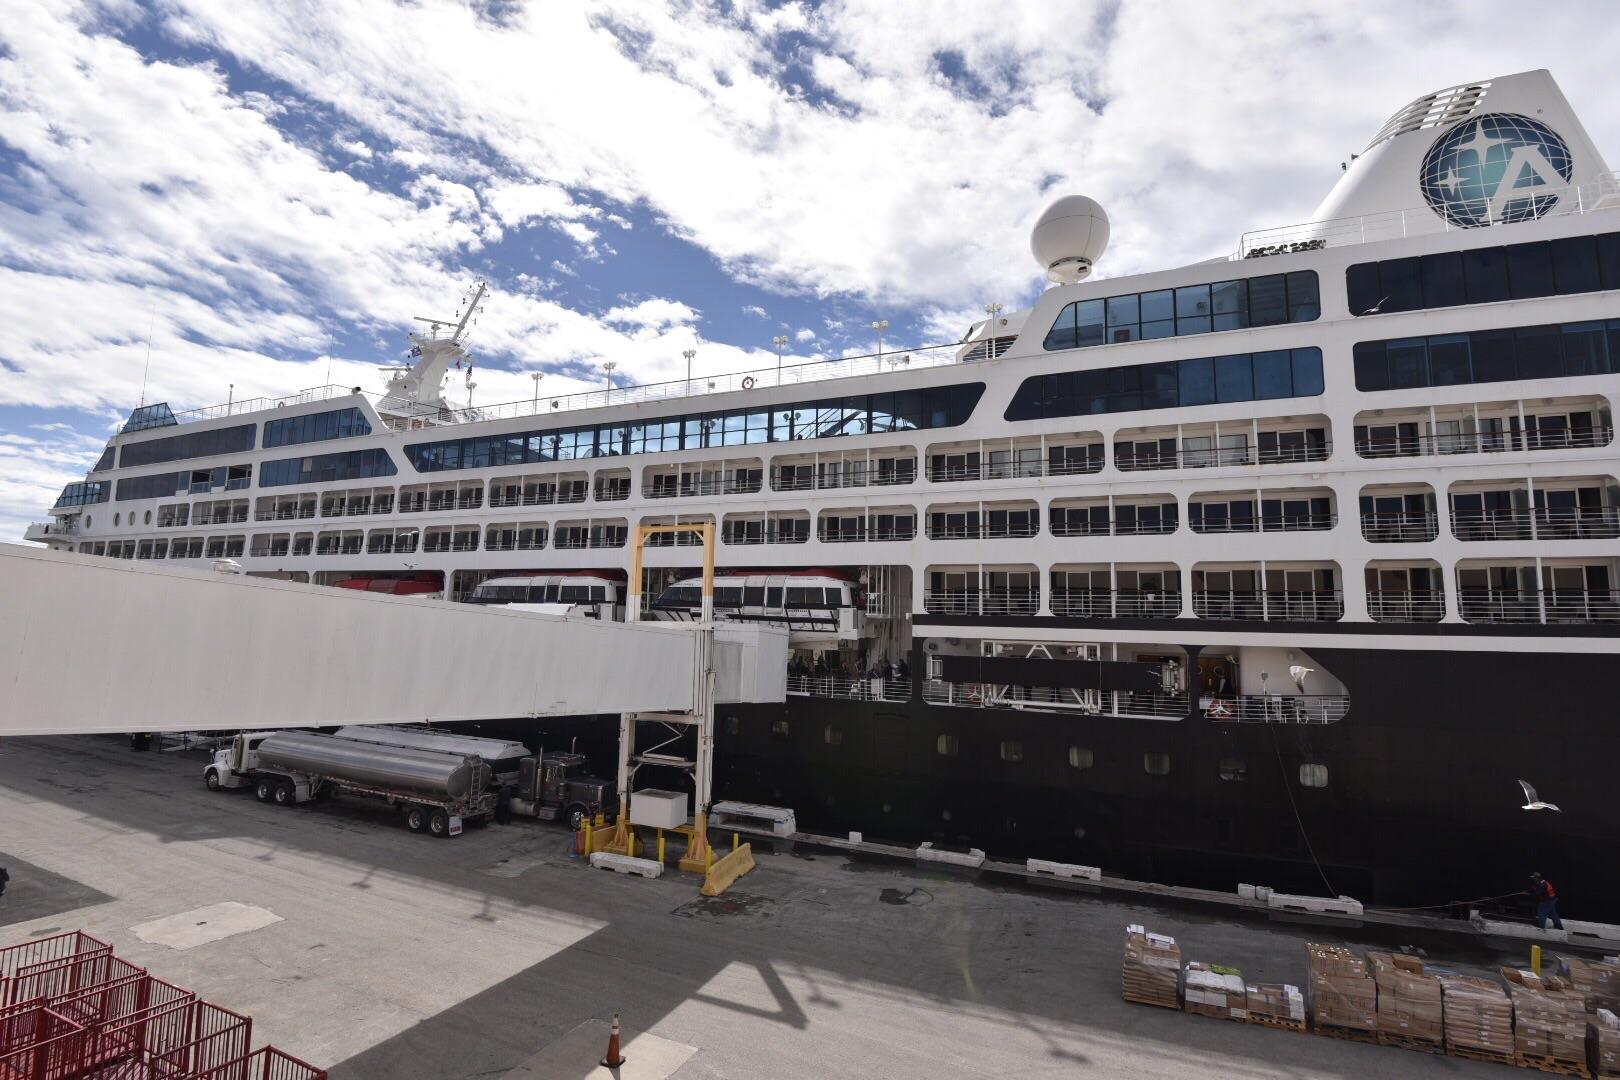 Azamara Journey docked in Miami